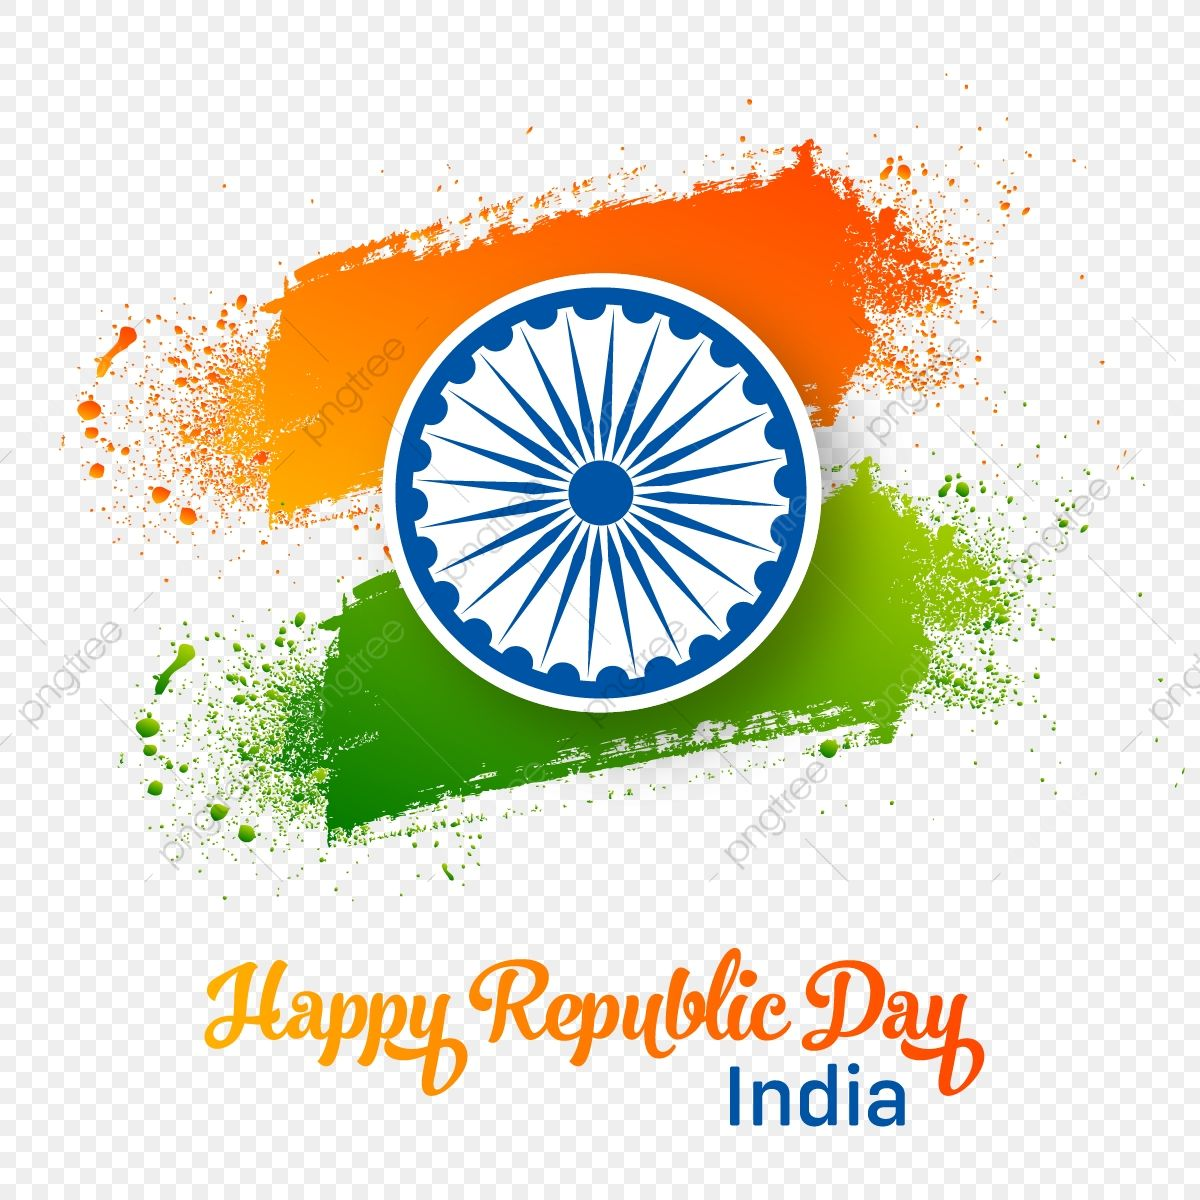 Creative 26 January Happy Republic Day Brush Splash Tricolor Tiranga Republic Day Celebration Indian Png And Vector With Transparent Background For Free Down Republic Day Happy Republic Day Brush Splash